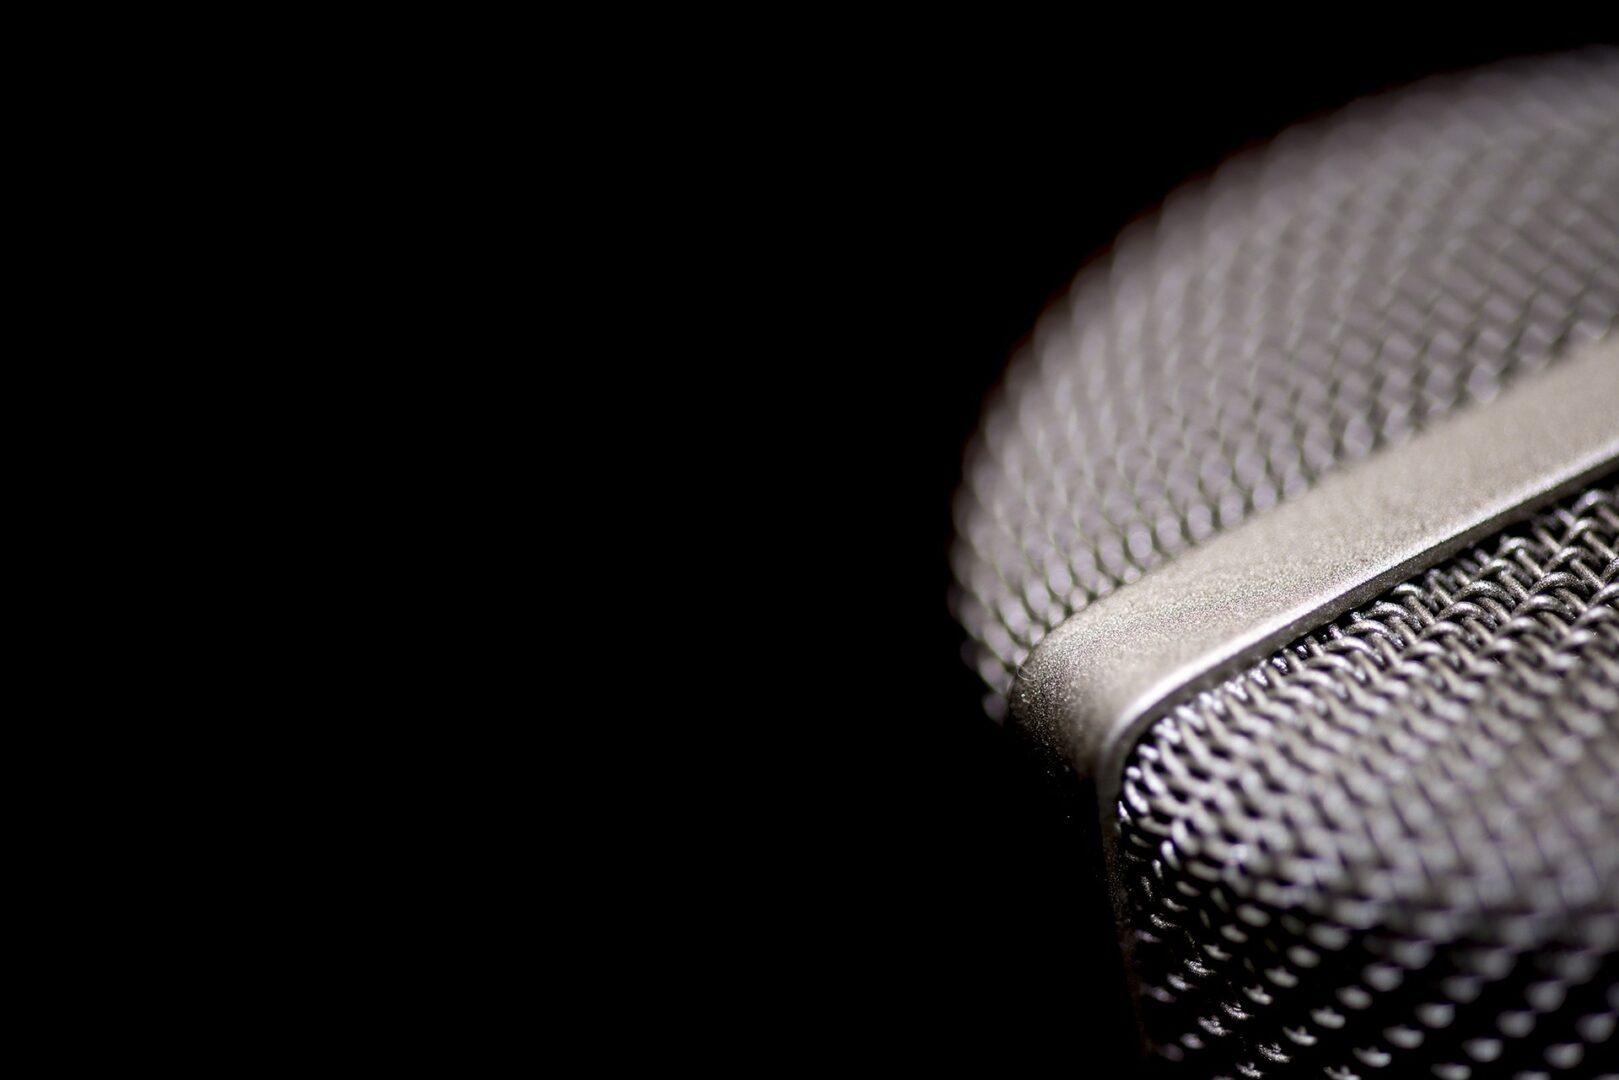 microphone-1102739_1920